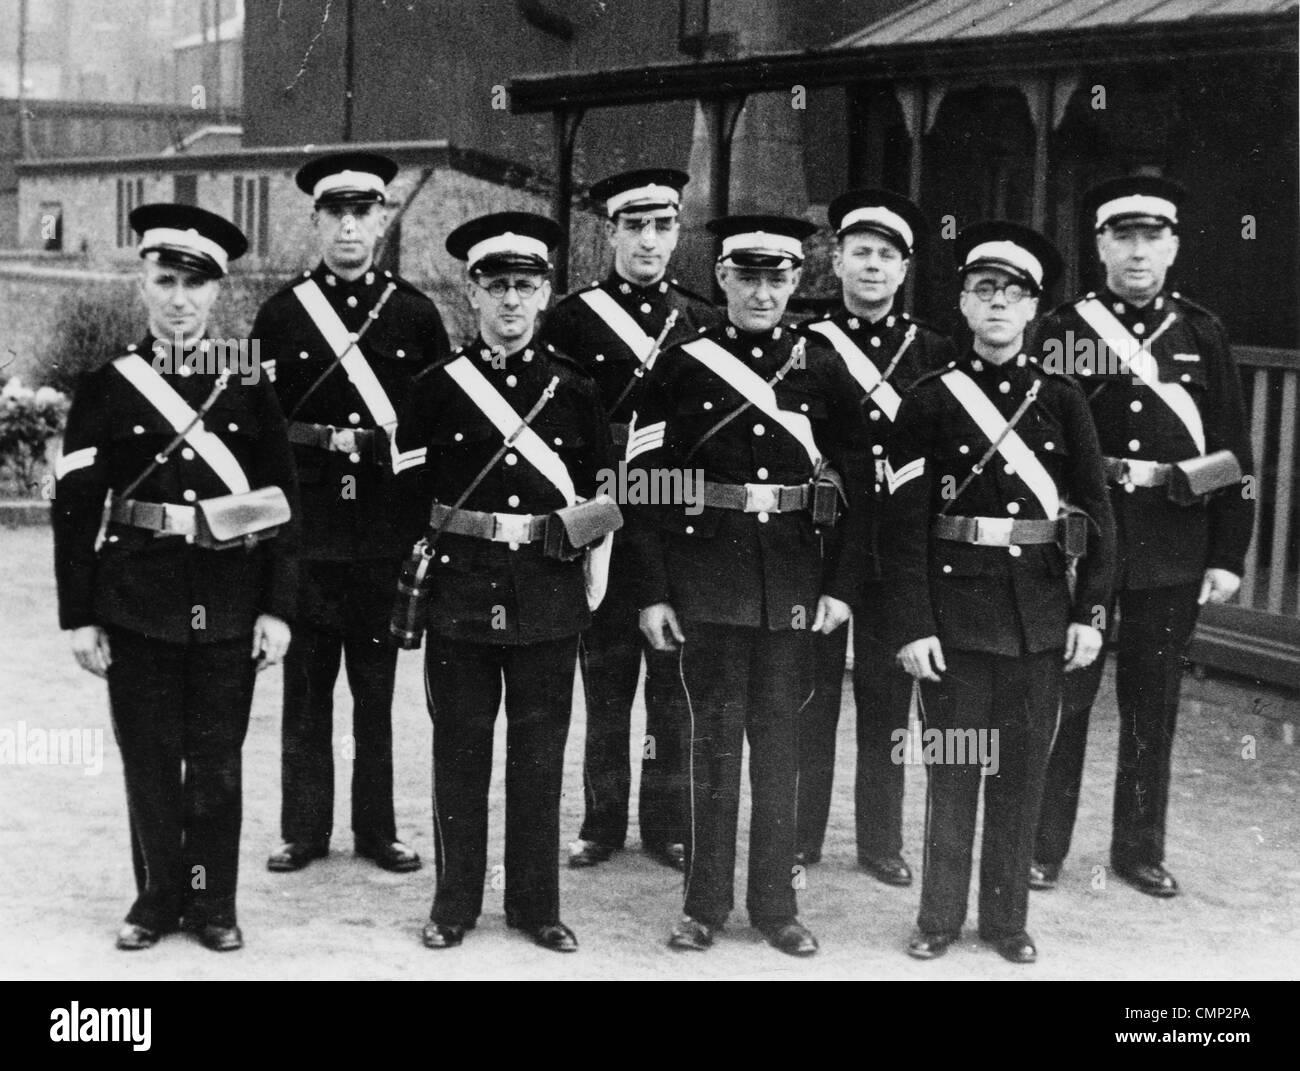 St. John's Ambulance Brigade, GKN Sankey, Wolverhampton, 1940. The Brigade in Bilston. They were part of the Sankey Stock Photo